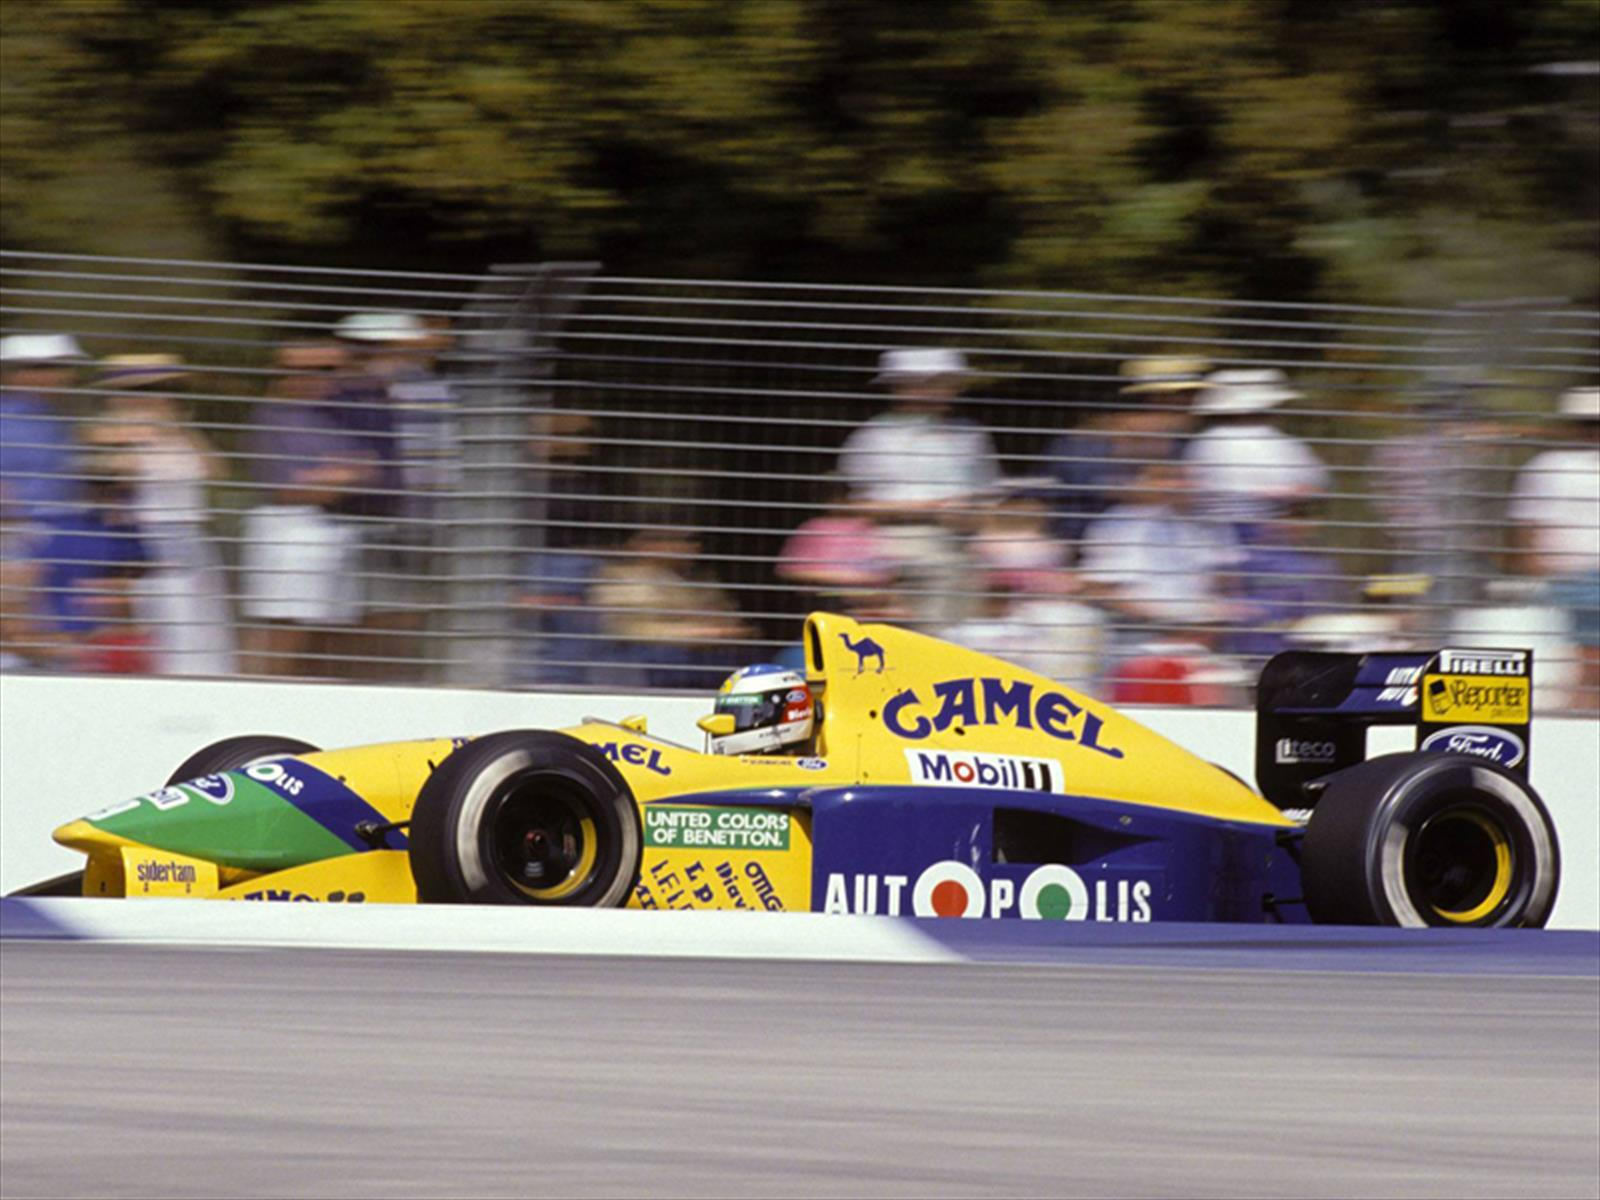 F1 benetton ex schumacher for Catalogo grand prix